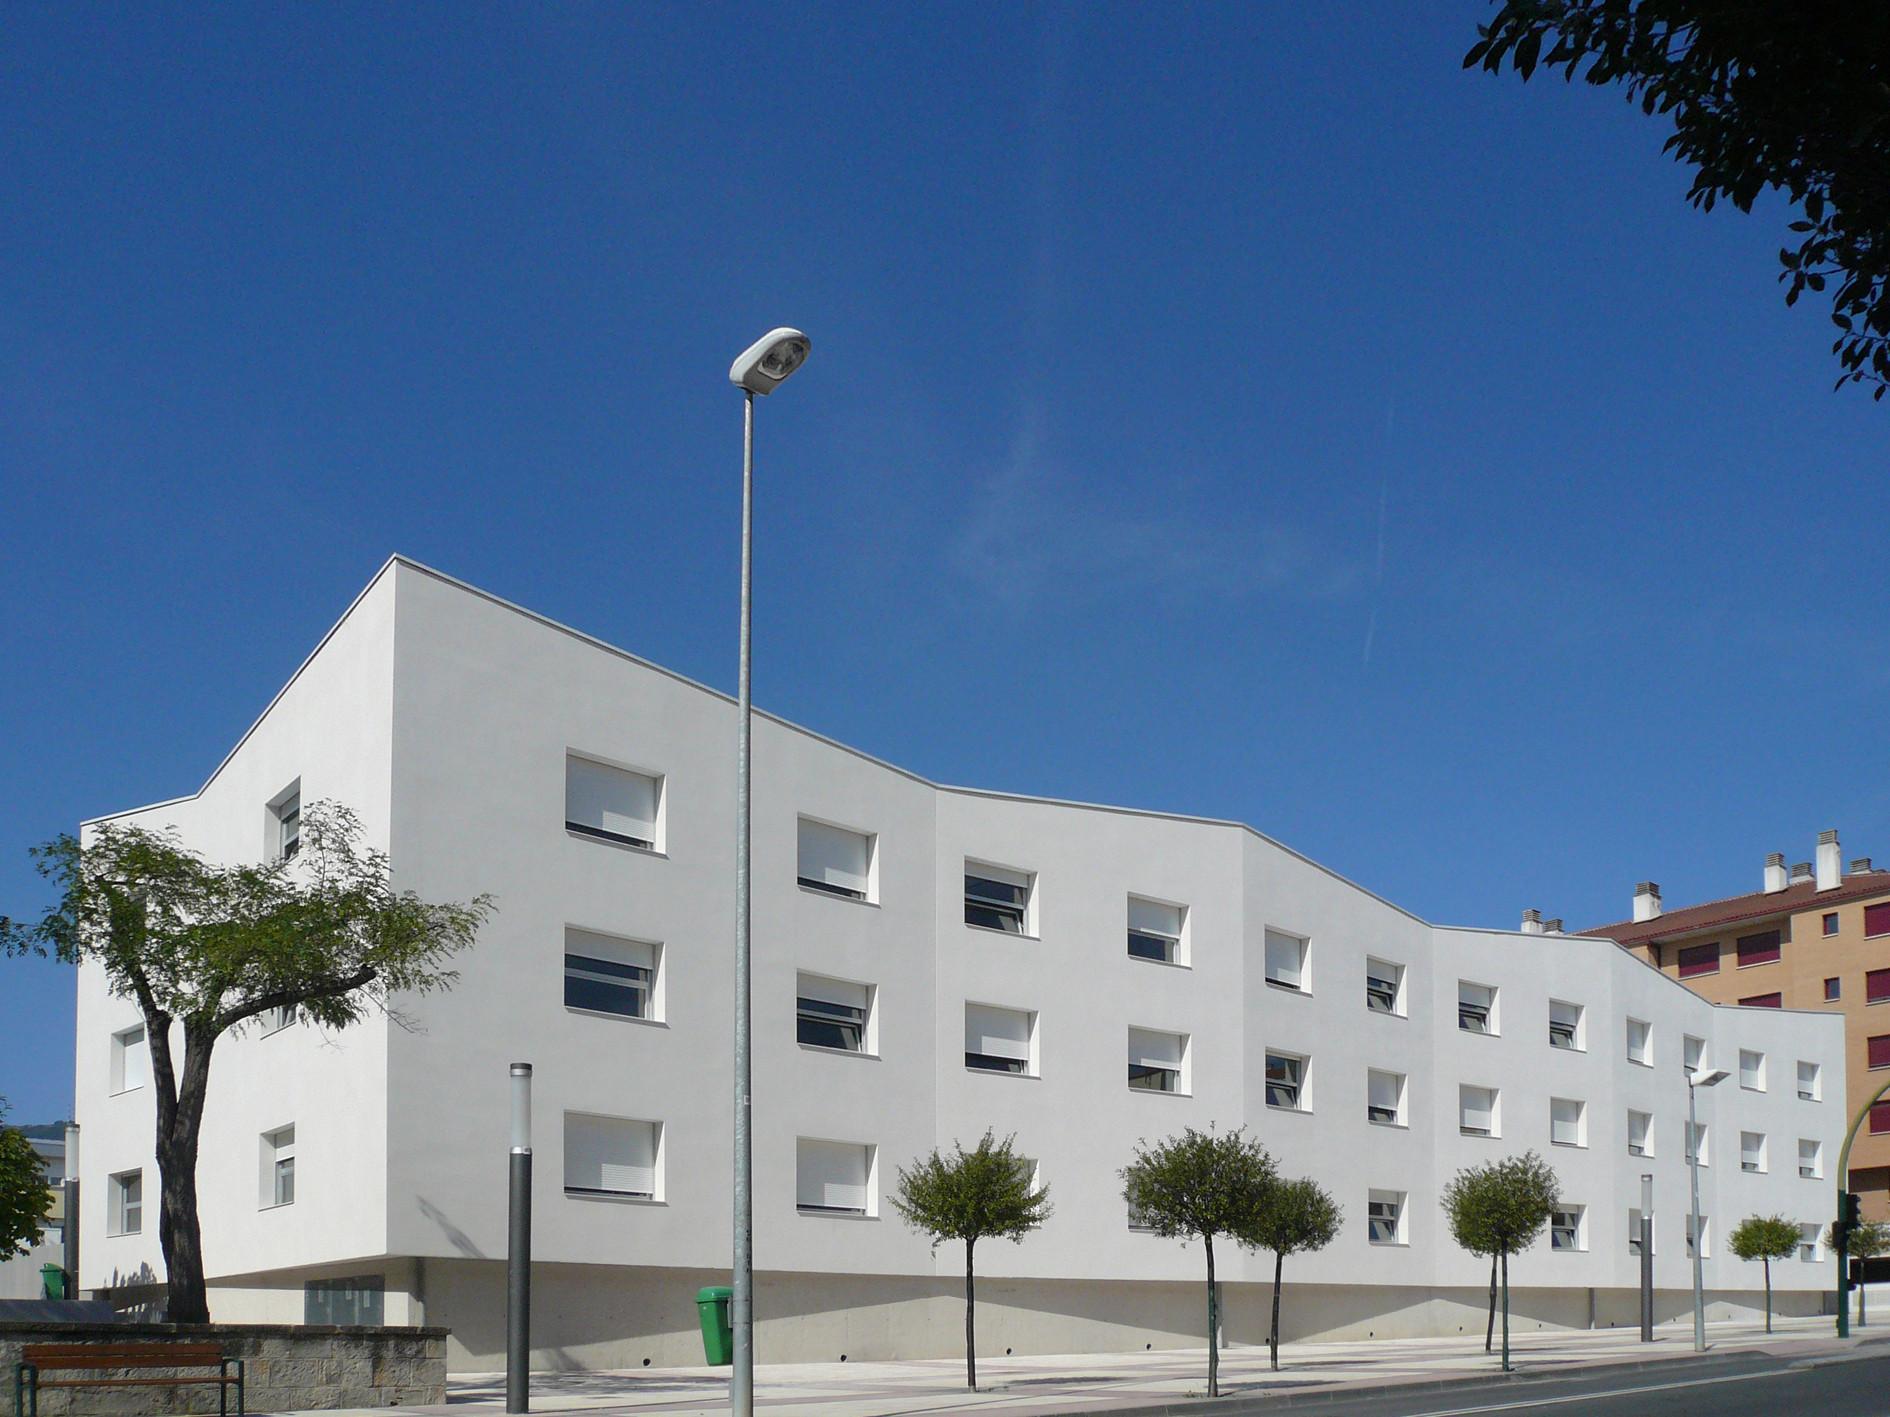 "New Public School for Primary Education ""Ave Maria-Patxi Larrainzar"" / Taller Básico de Arquitectura, © Xabier Ilundain Madurga, Taller Básico de Arquitectura"